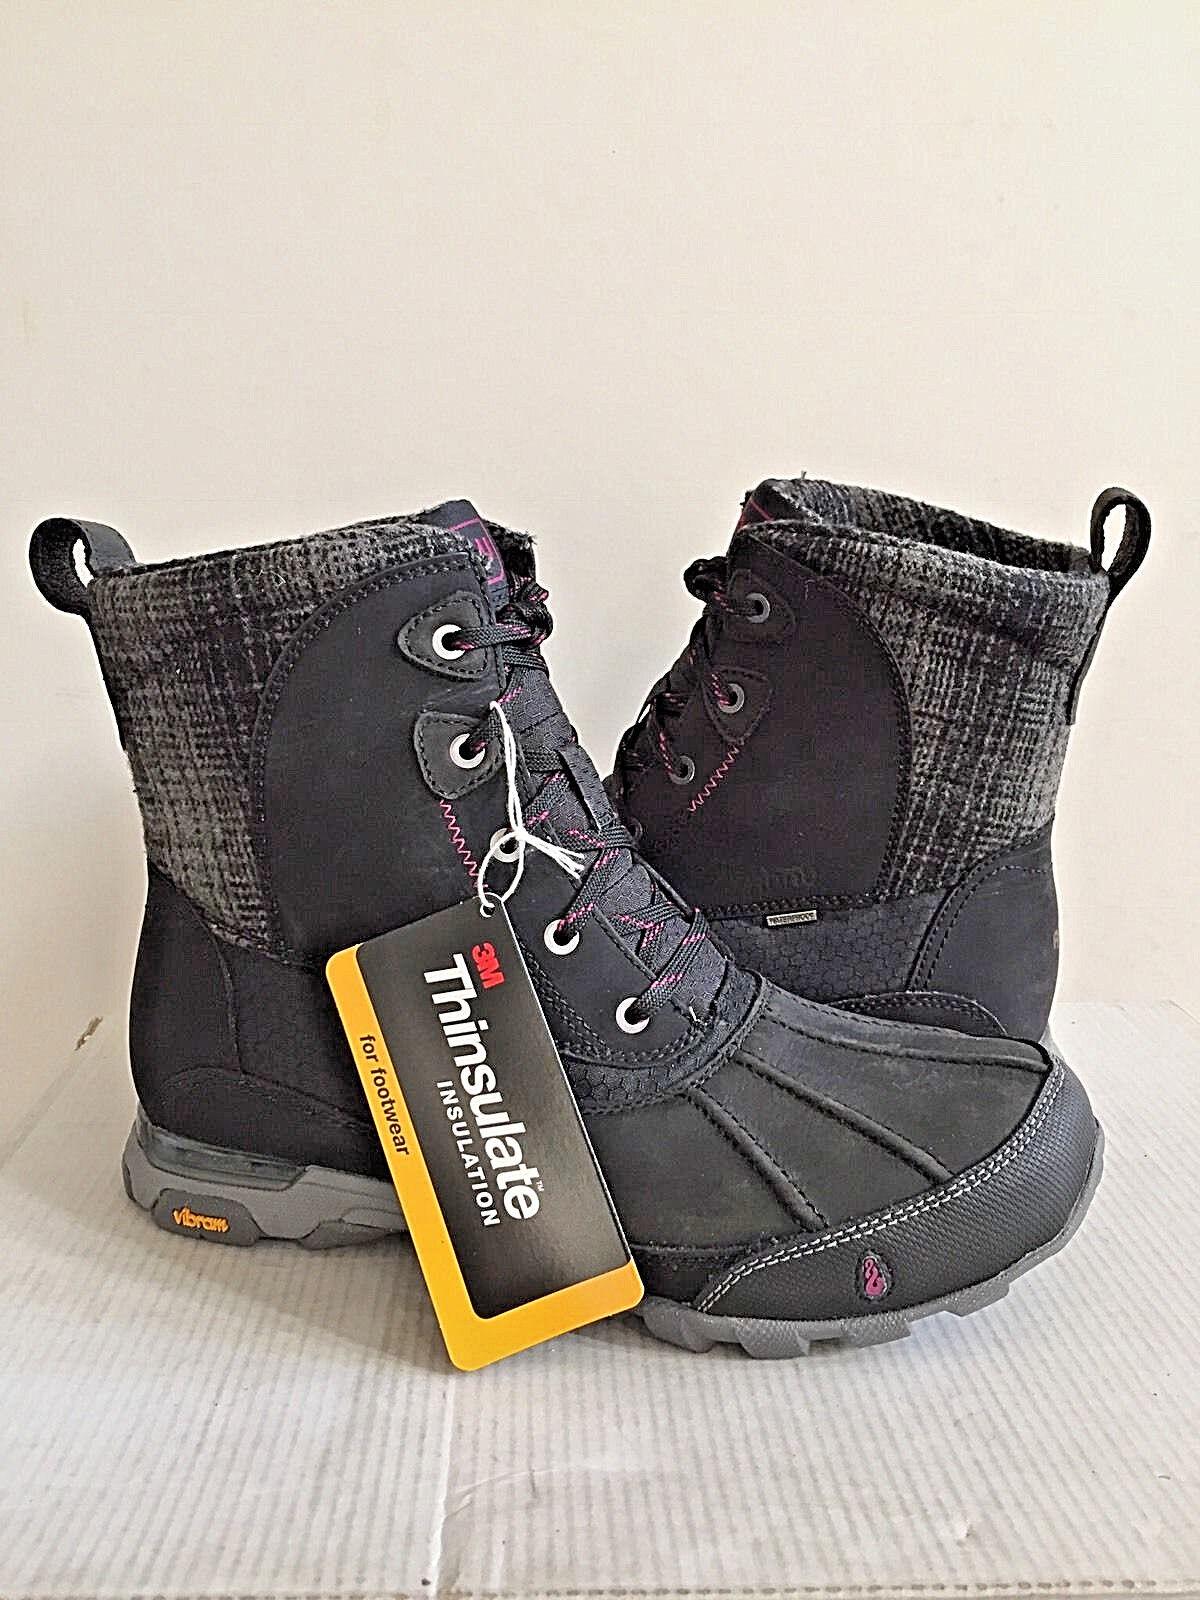 ANU  DONNE SUGAR PEAK nero INSULATA WP HING scarpe US 8   EU 39   UK 6 NUOVO  buona qualità